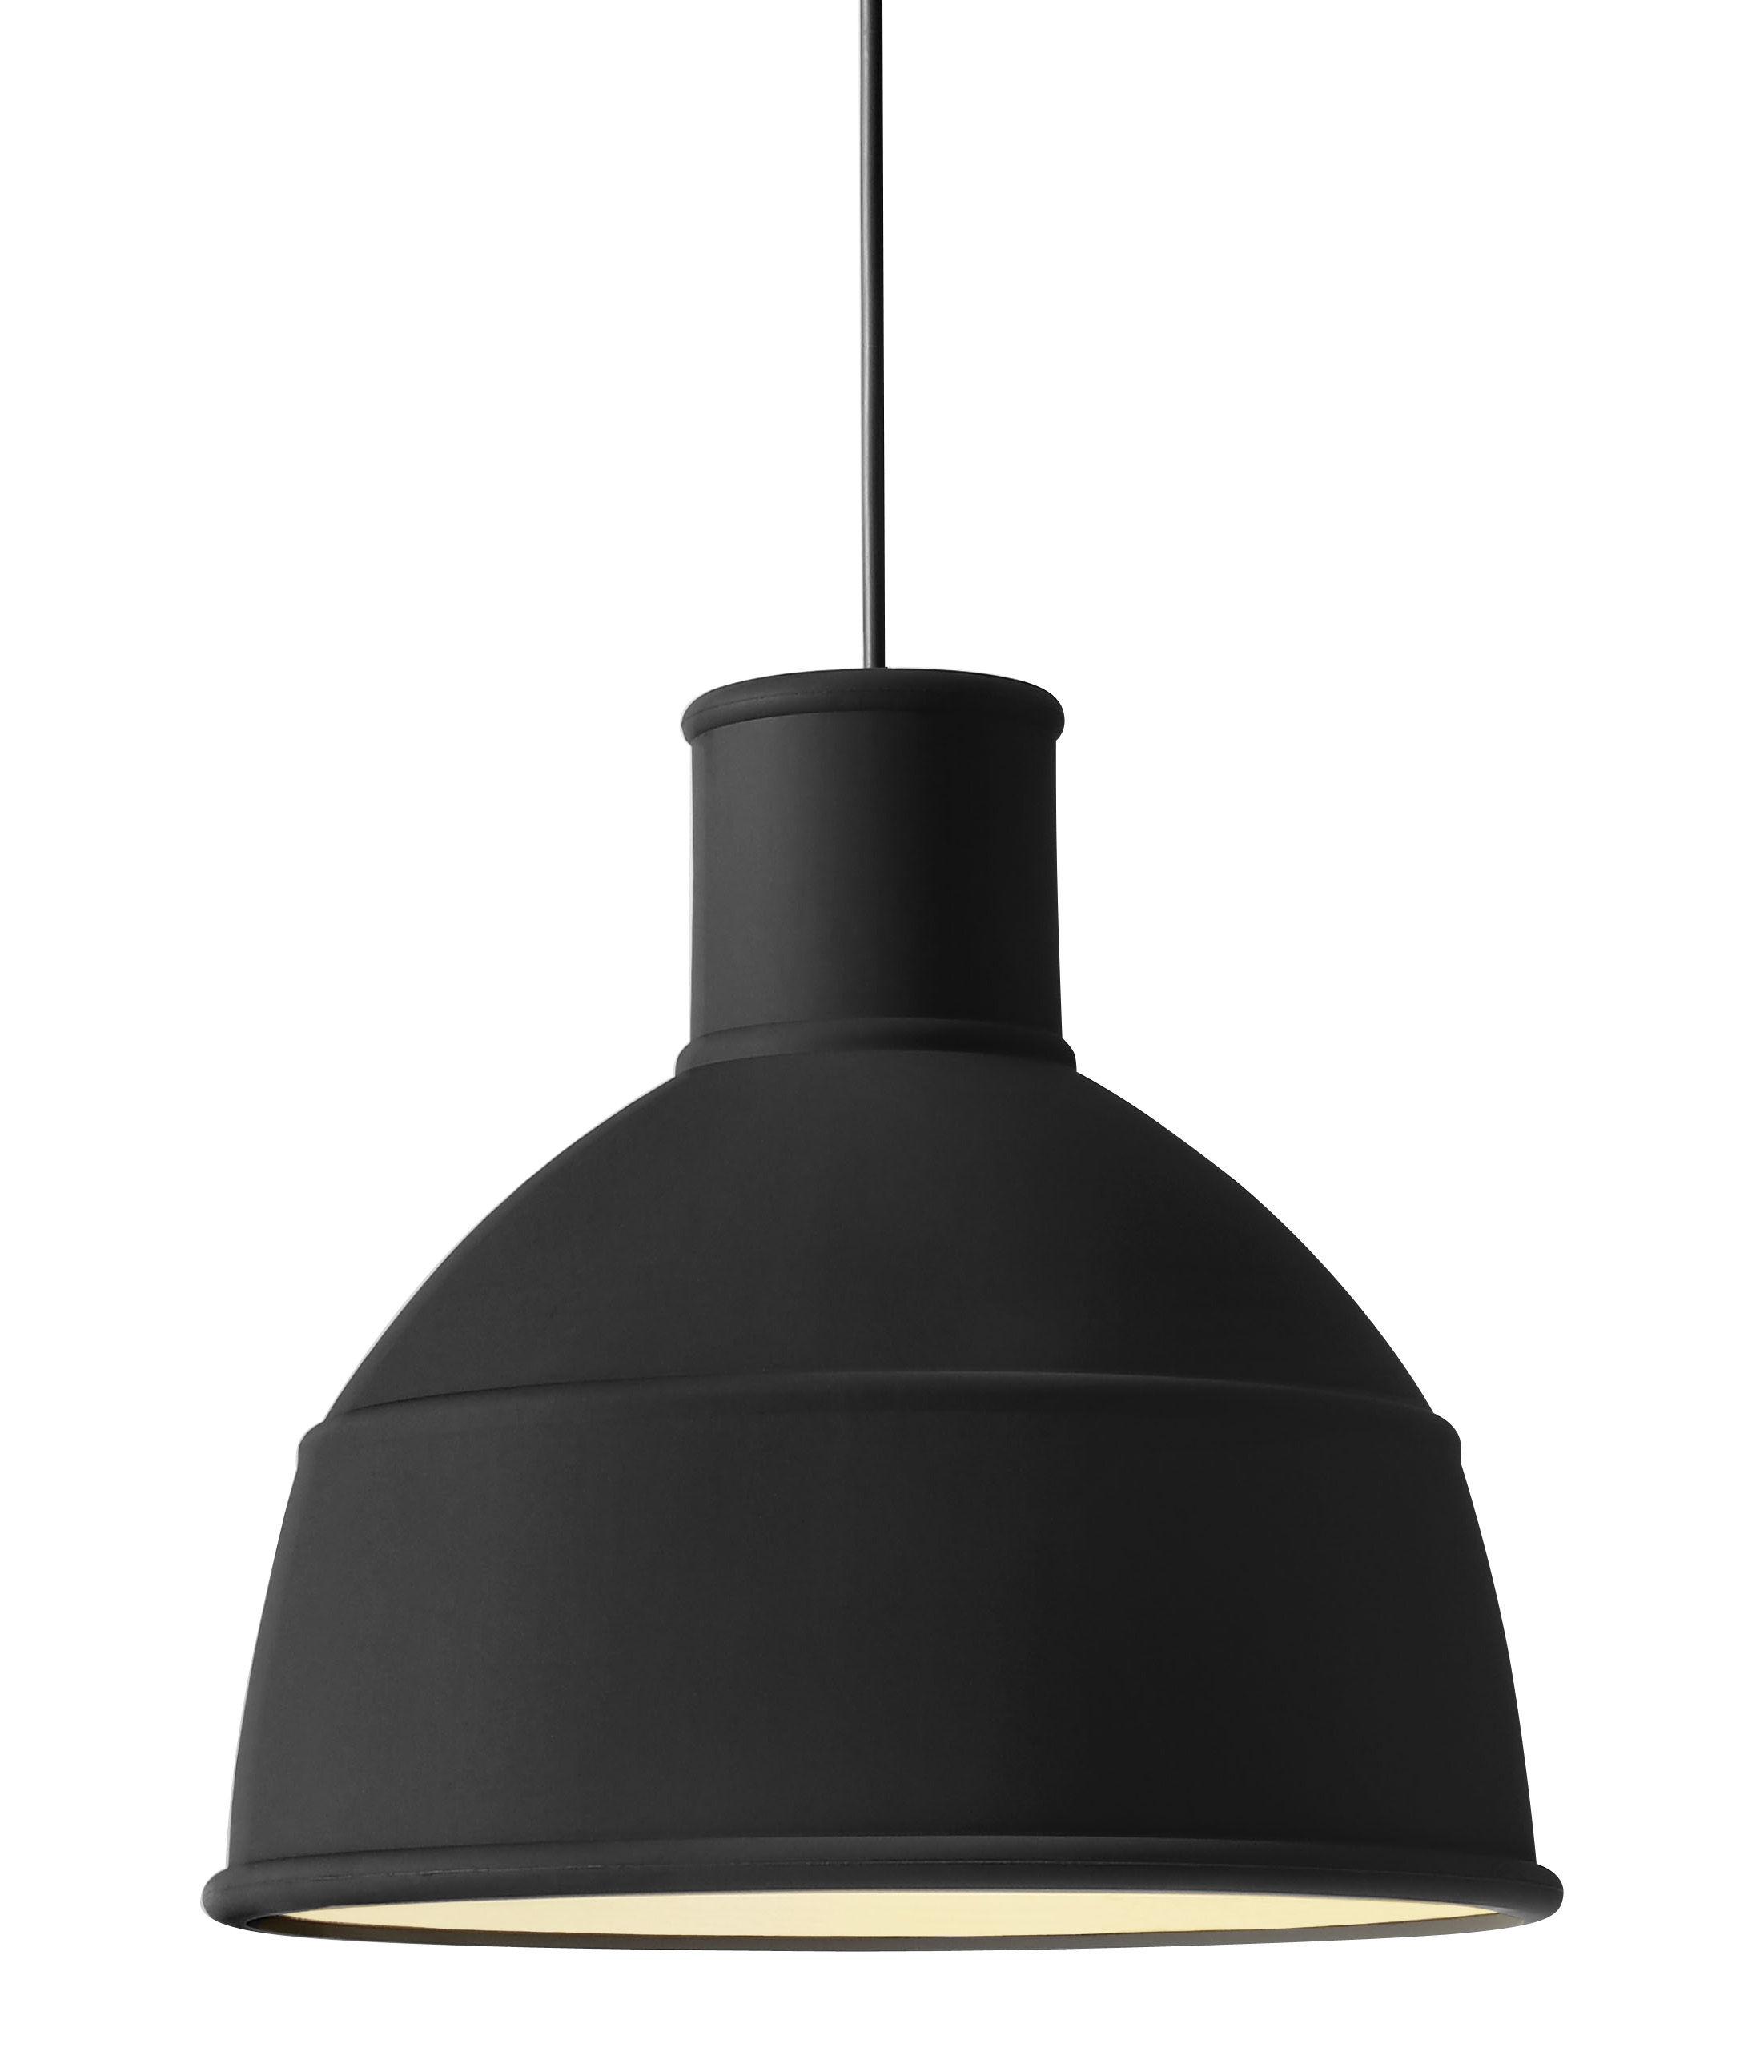 Leuchten - Pendelleuchten - Unfold Pendelleuchte - Muuto - Schwarz - Silikon